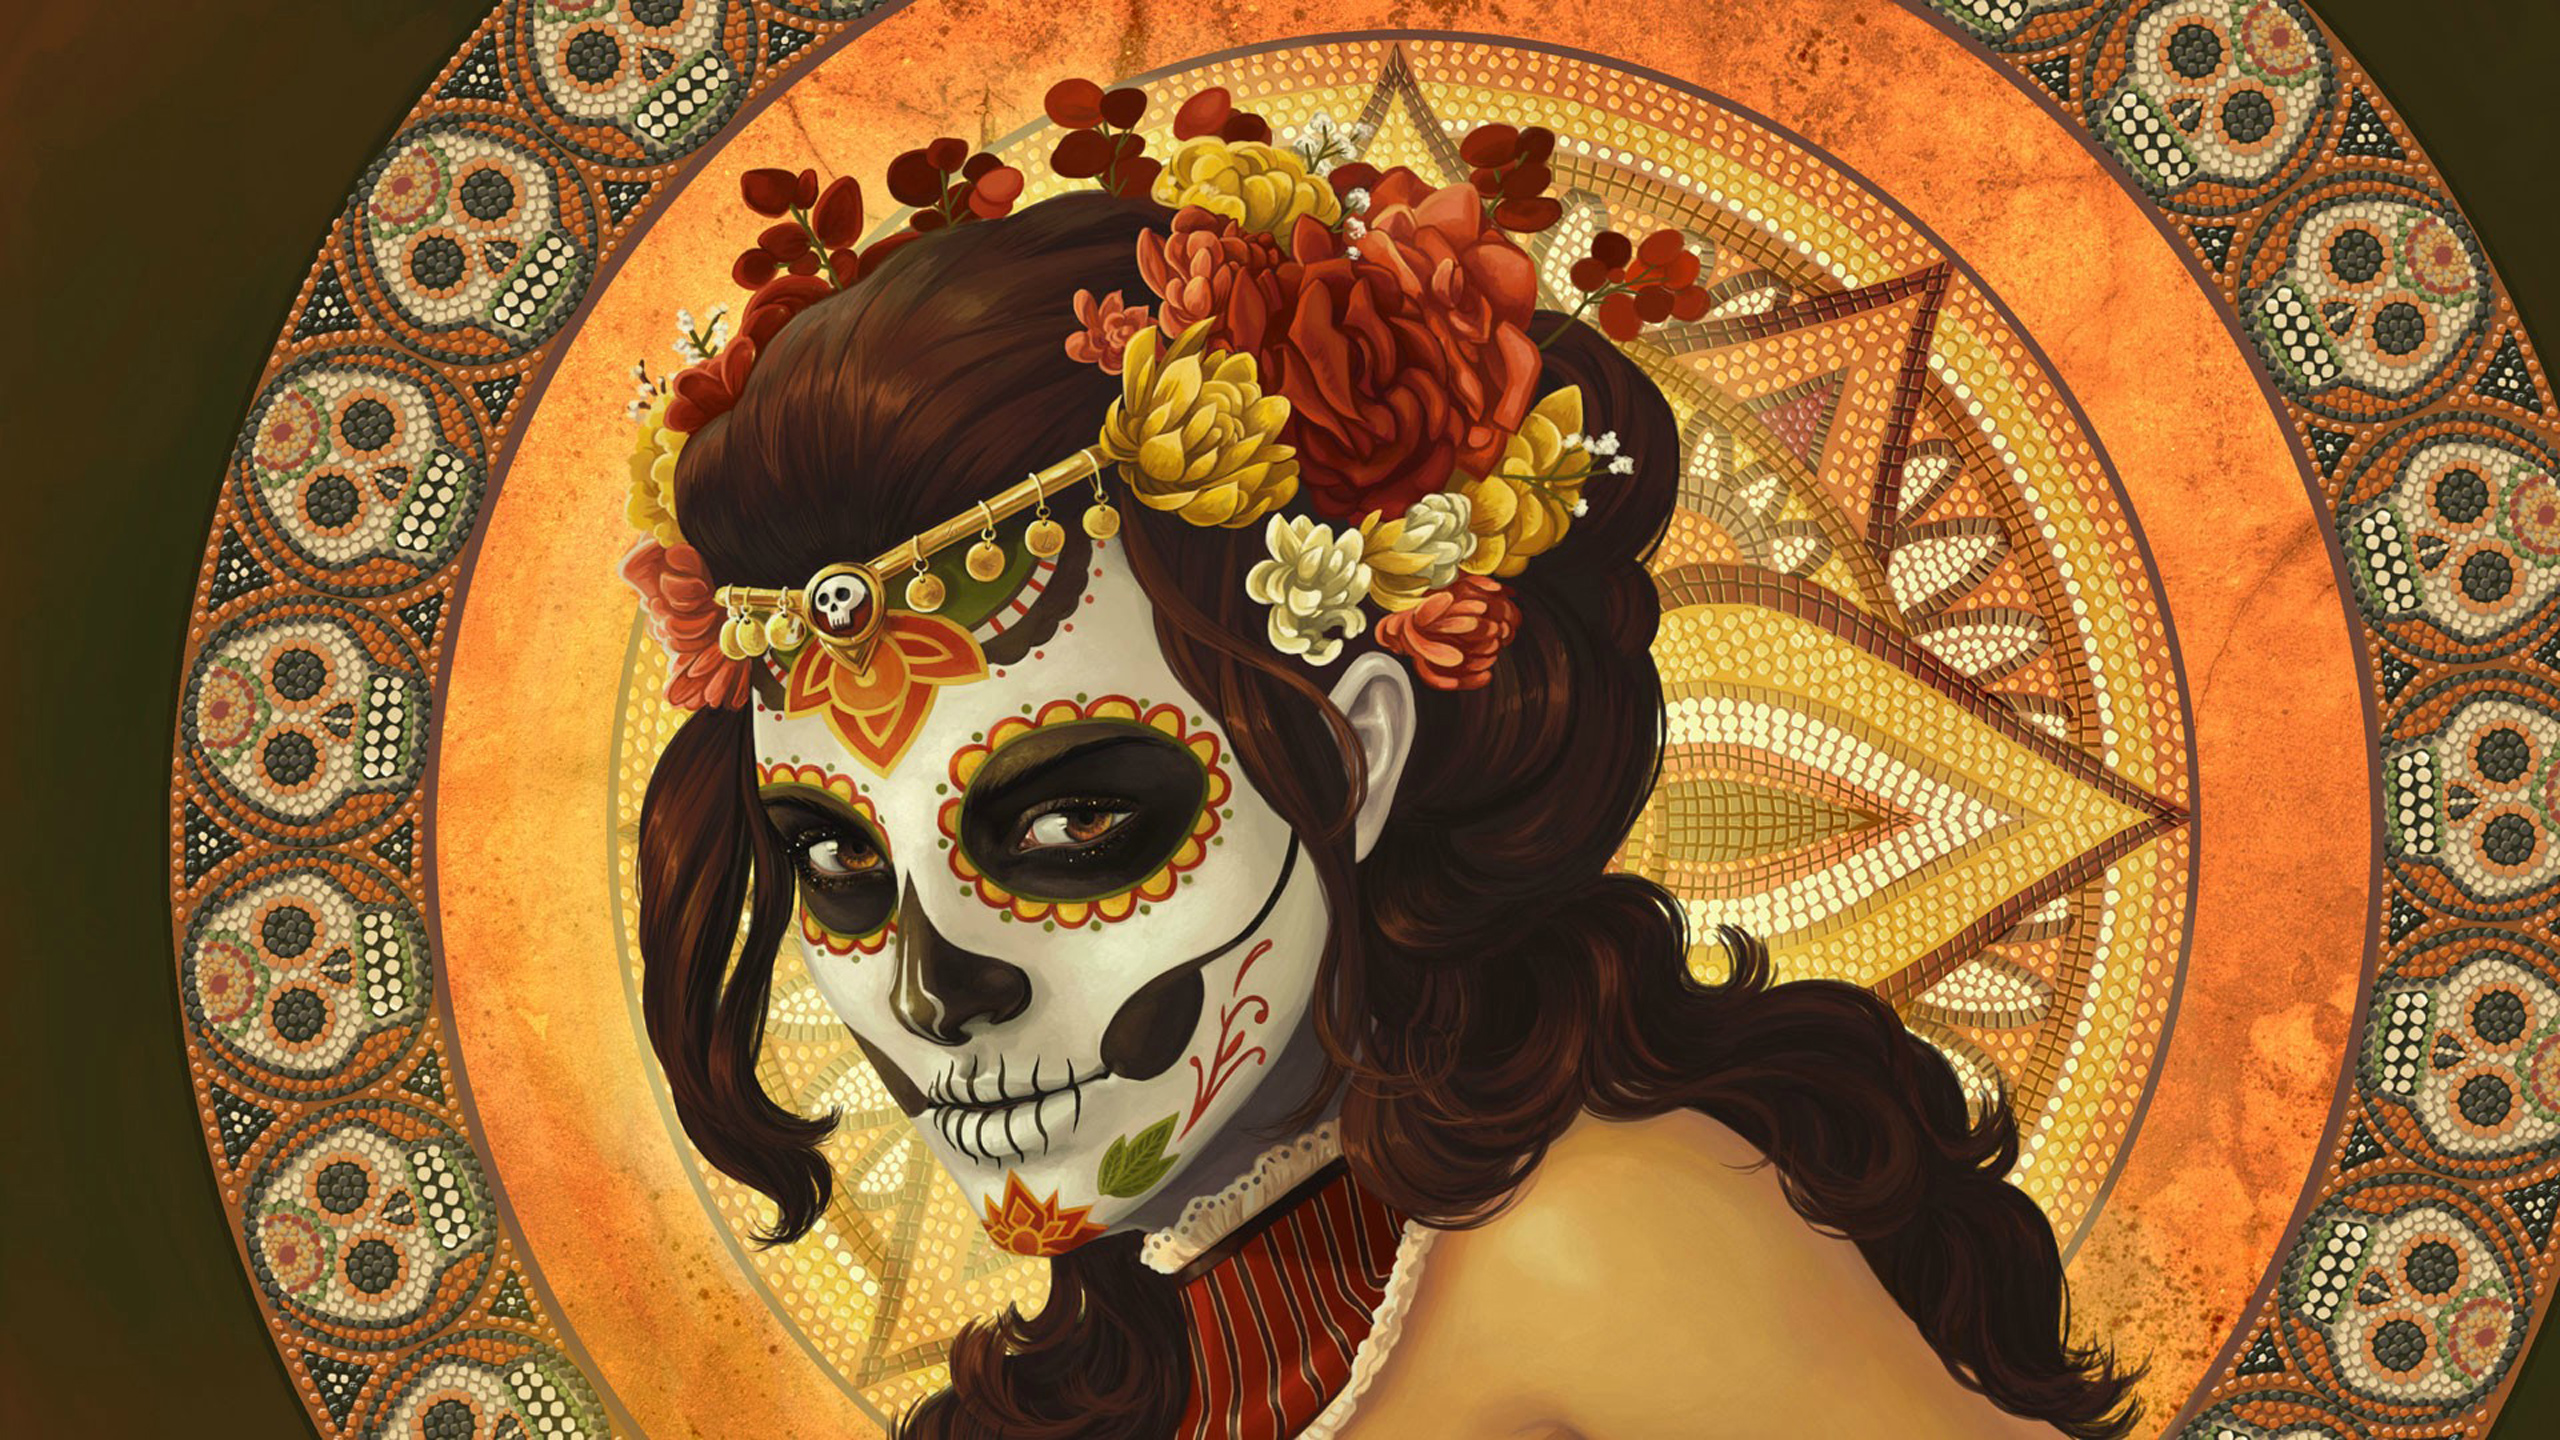 Girl Skull Makeup Art HD Wallpaper 2560x1440